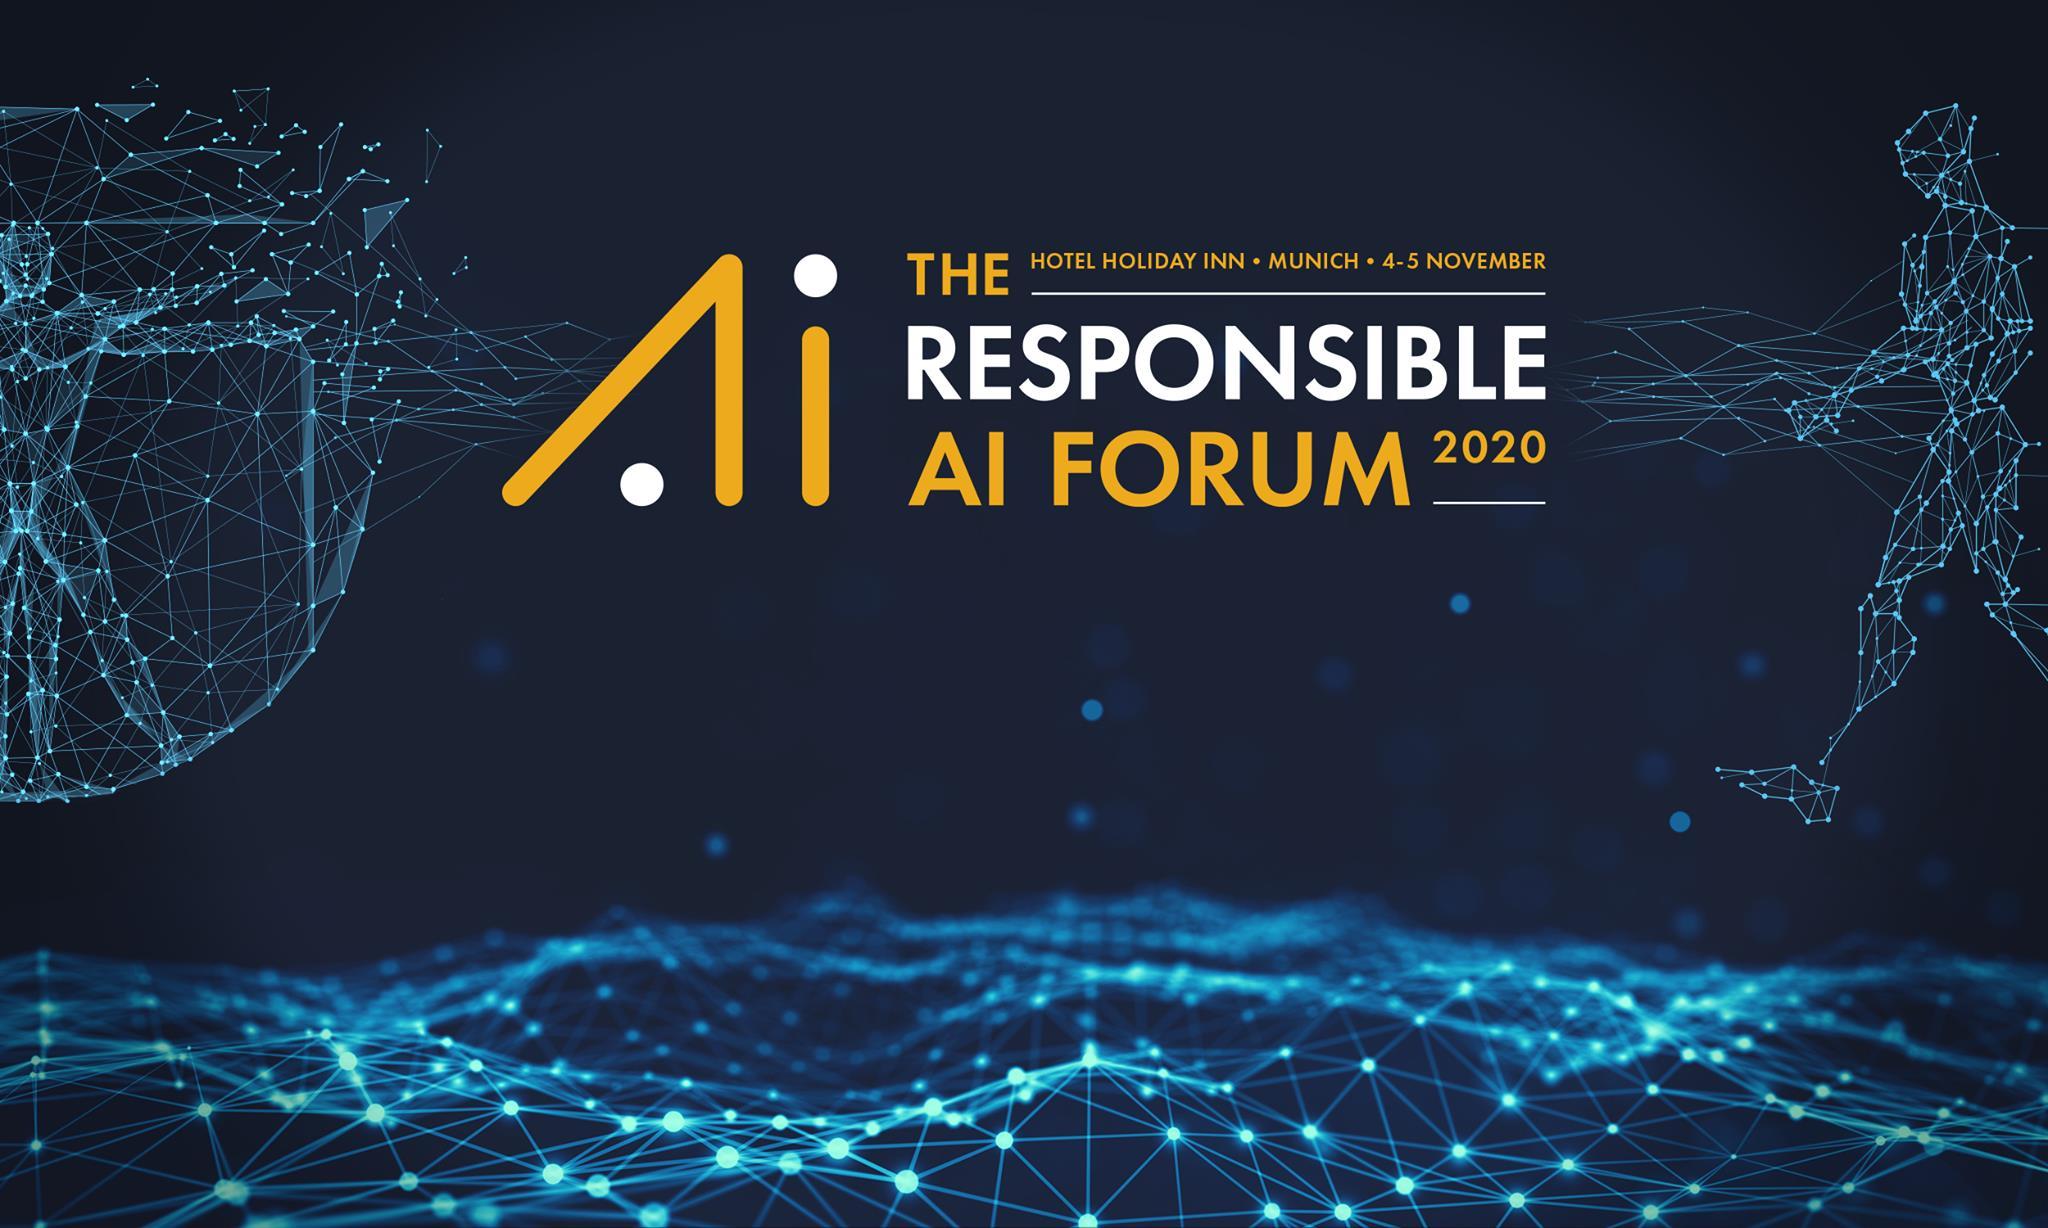 The Responsible AI Forum, 4-5 November 2020